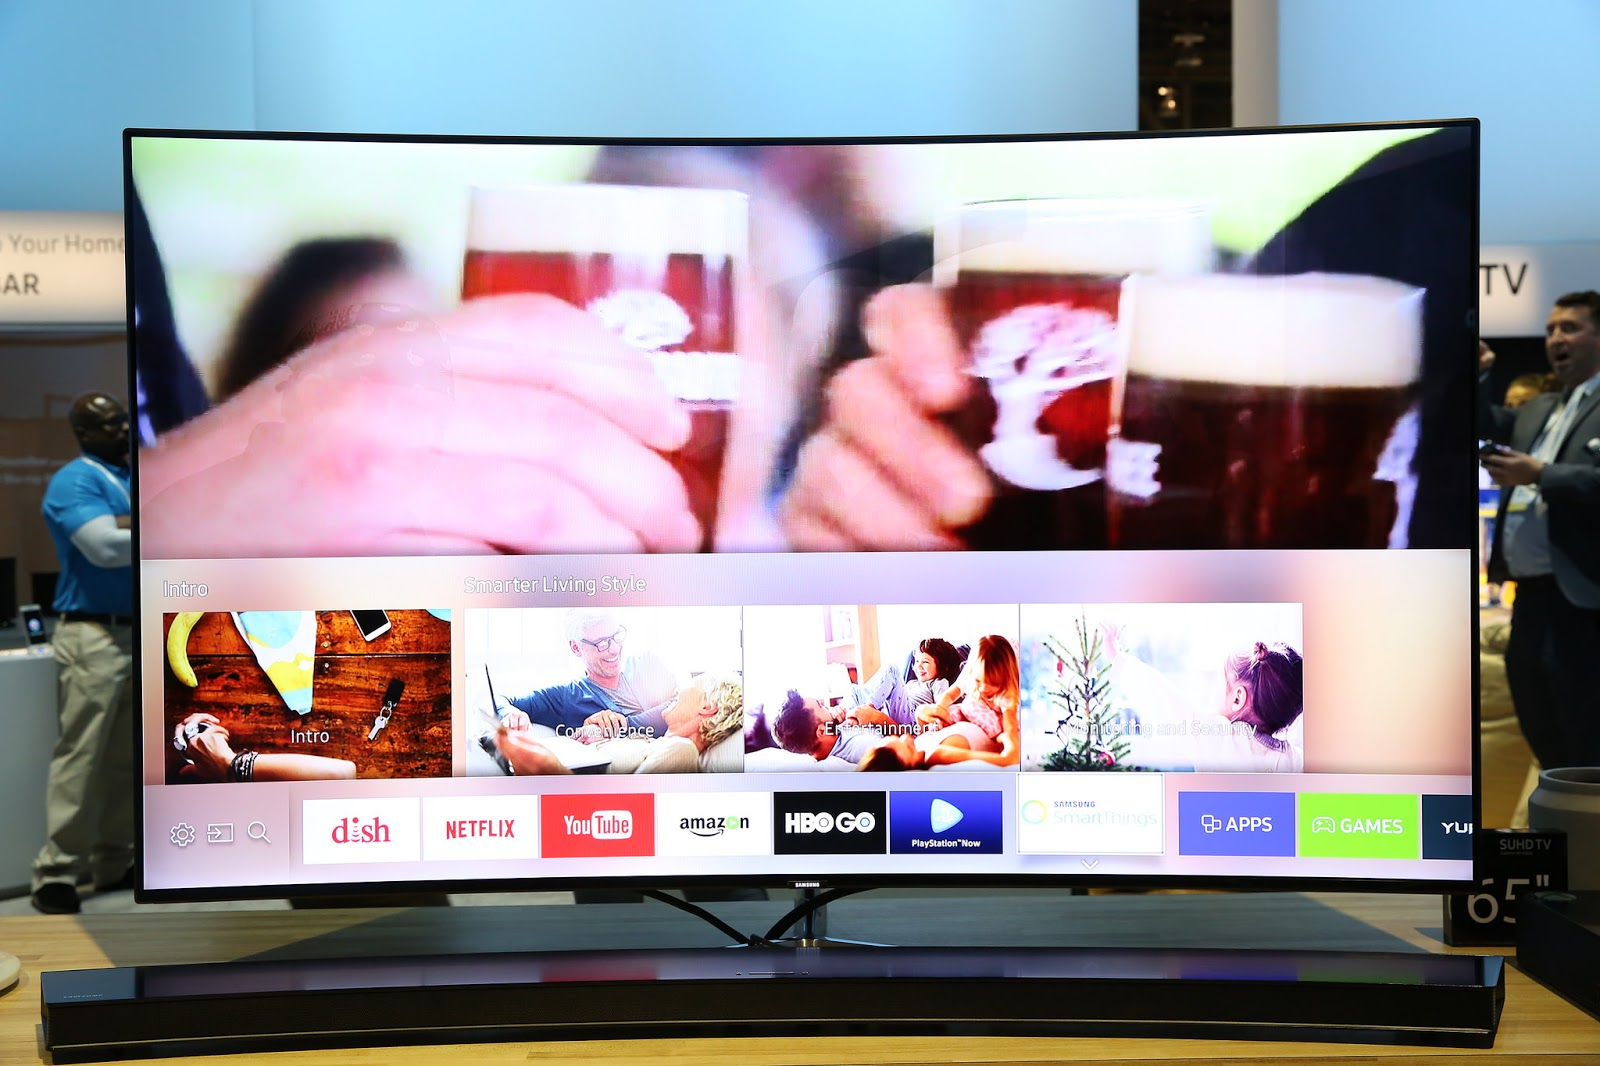 smart hub preview sekarang tersedia di tizen tv sdk 2 3 1. Black Bedroom Furniture Sets. Home Design Ideas